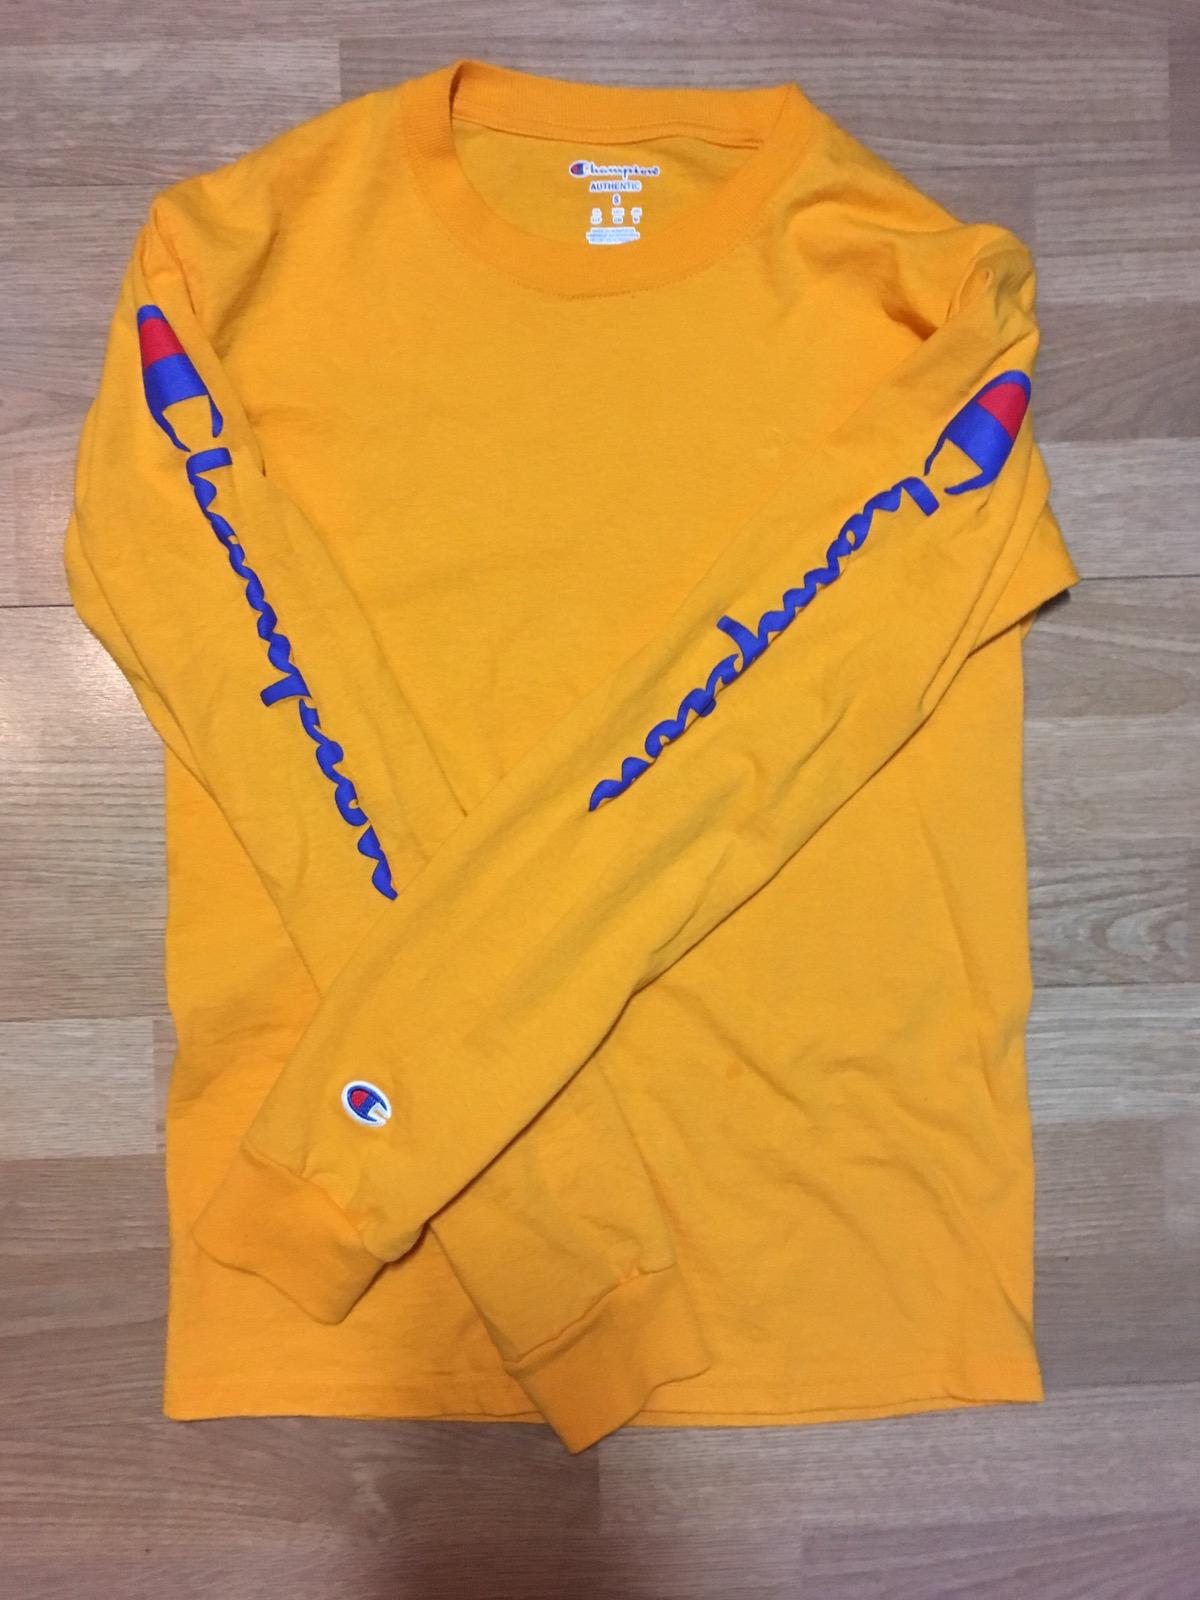 7b85ee42 Yellow Champion Sweatshirt Pacsun